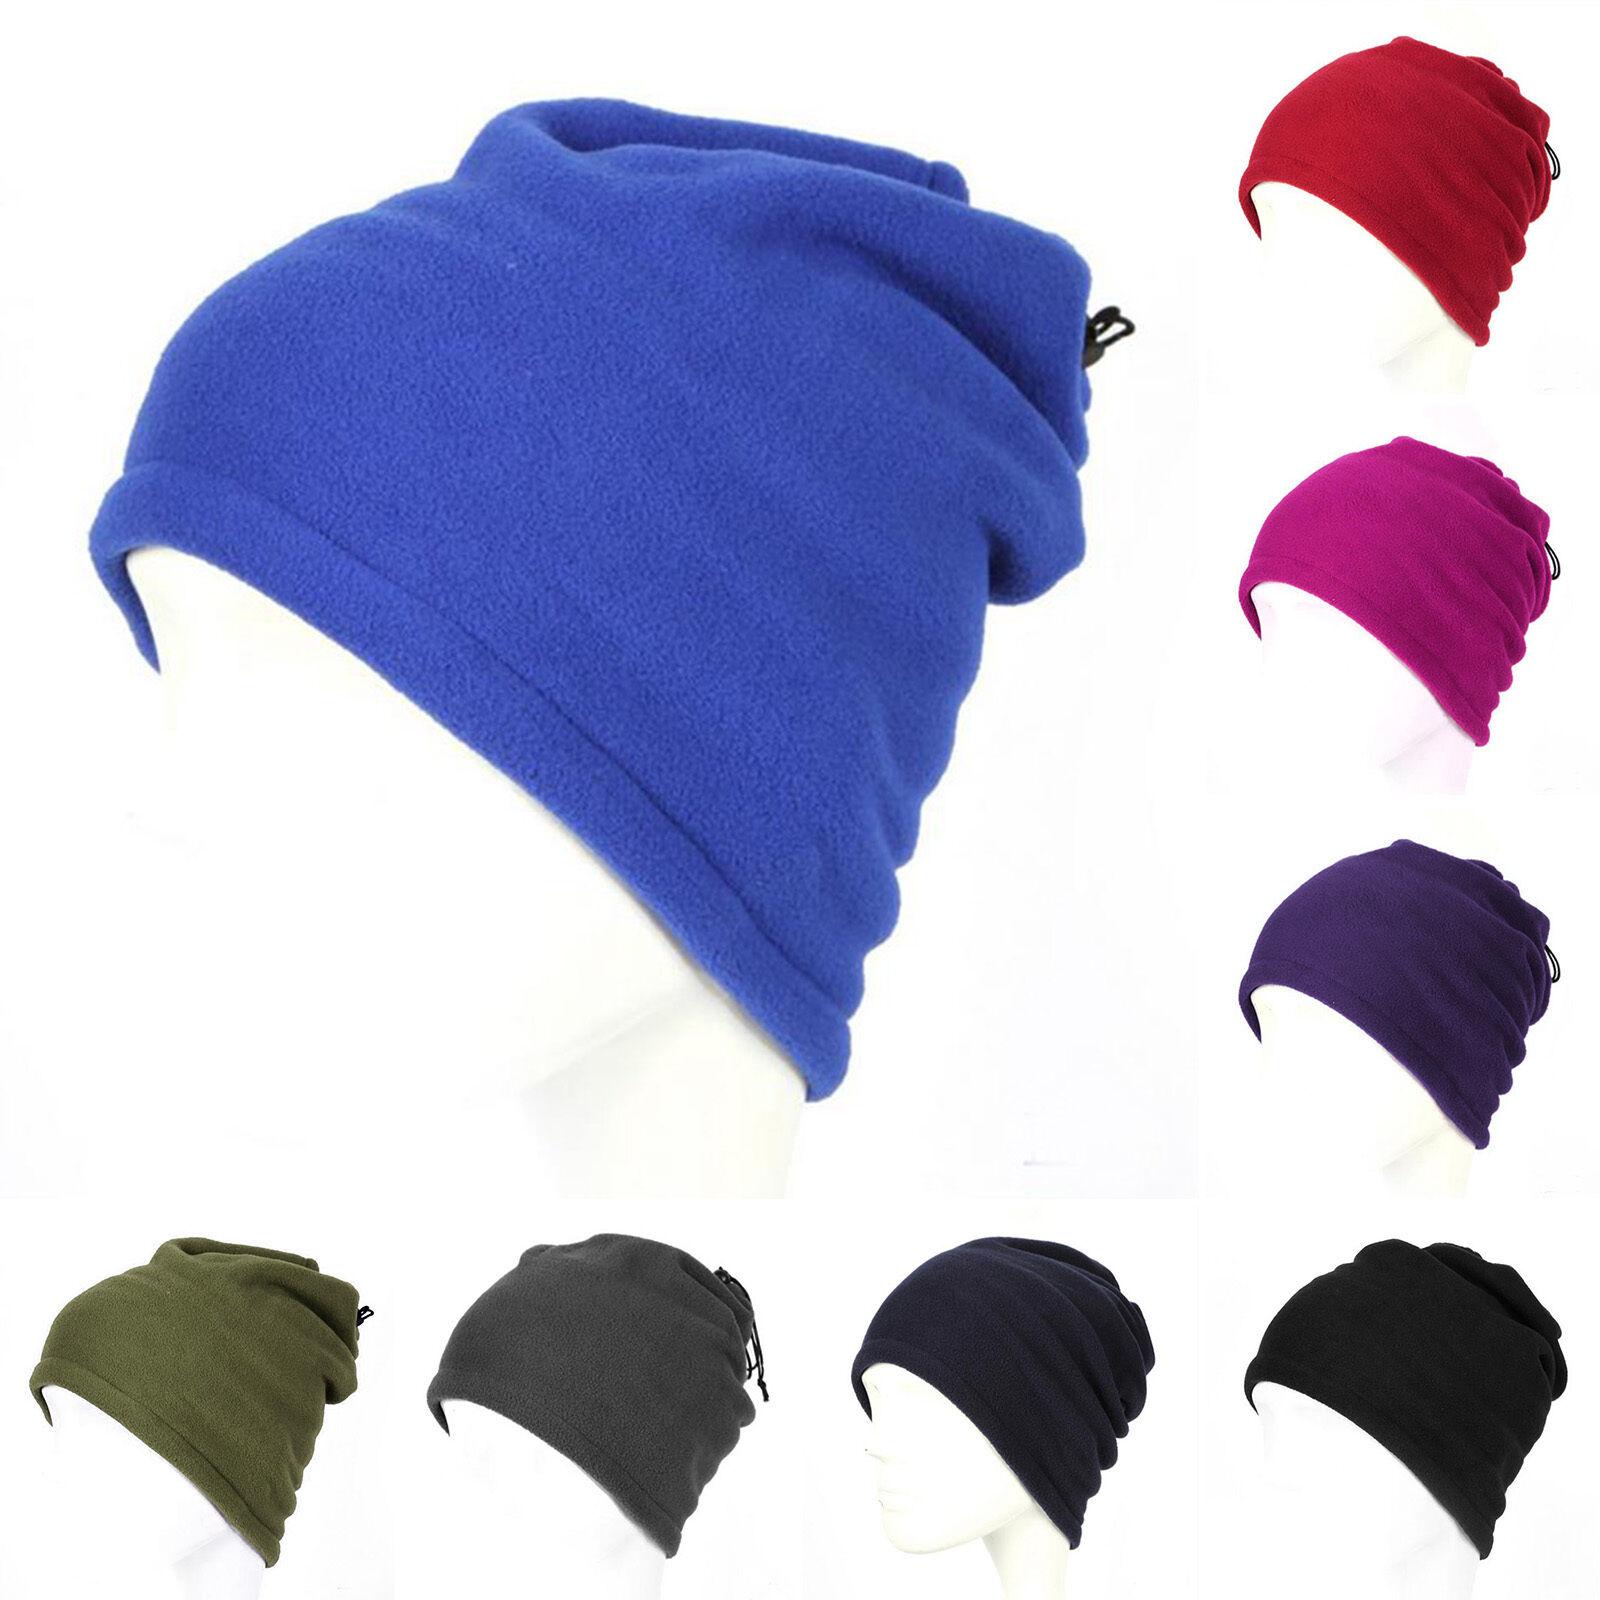 Nueva mujer cuello calentador térmico redecilla sombrero esquí desgaste  bufanda gorro pasamontañas de lana a7c27e7479d